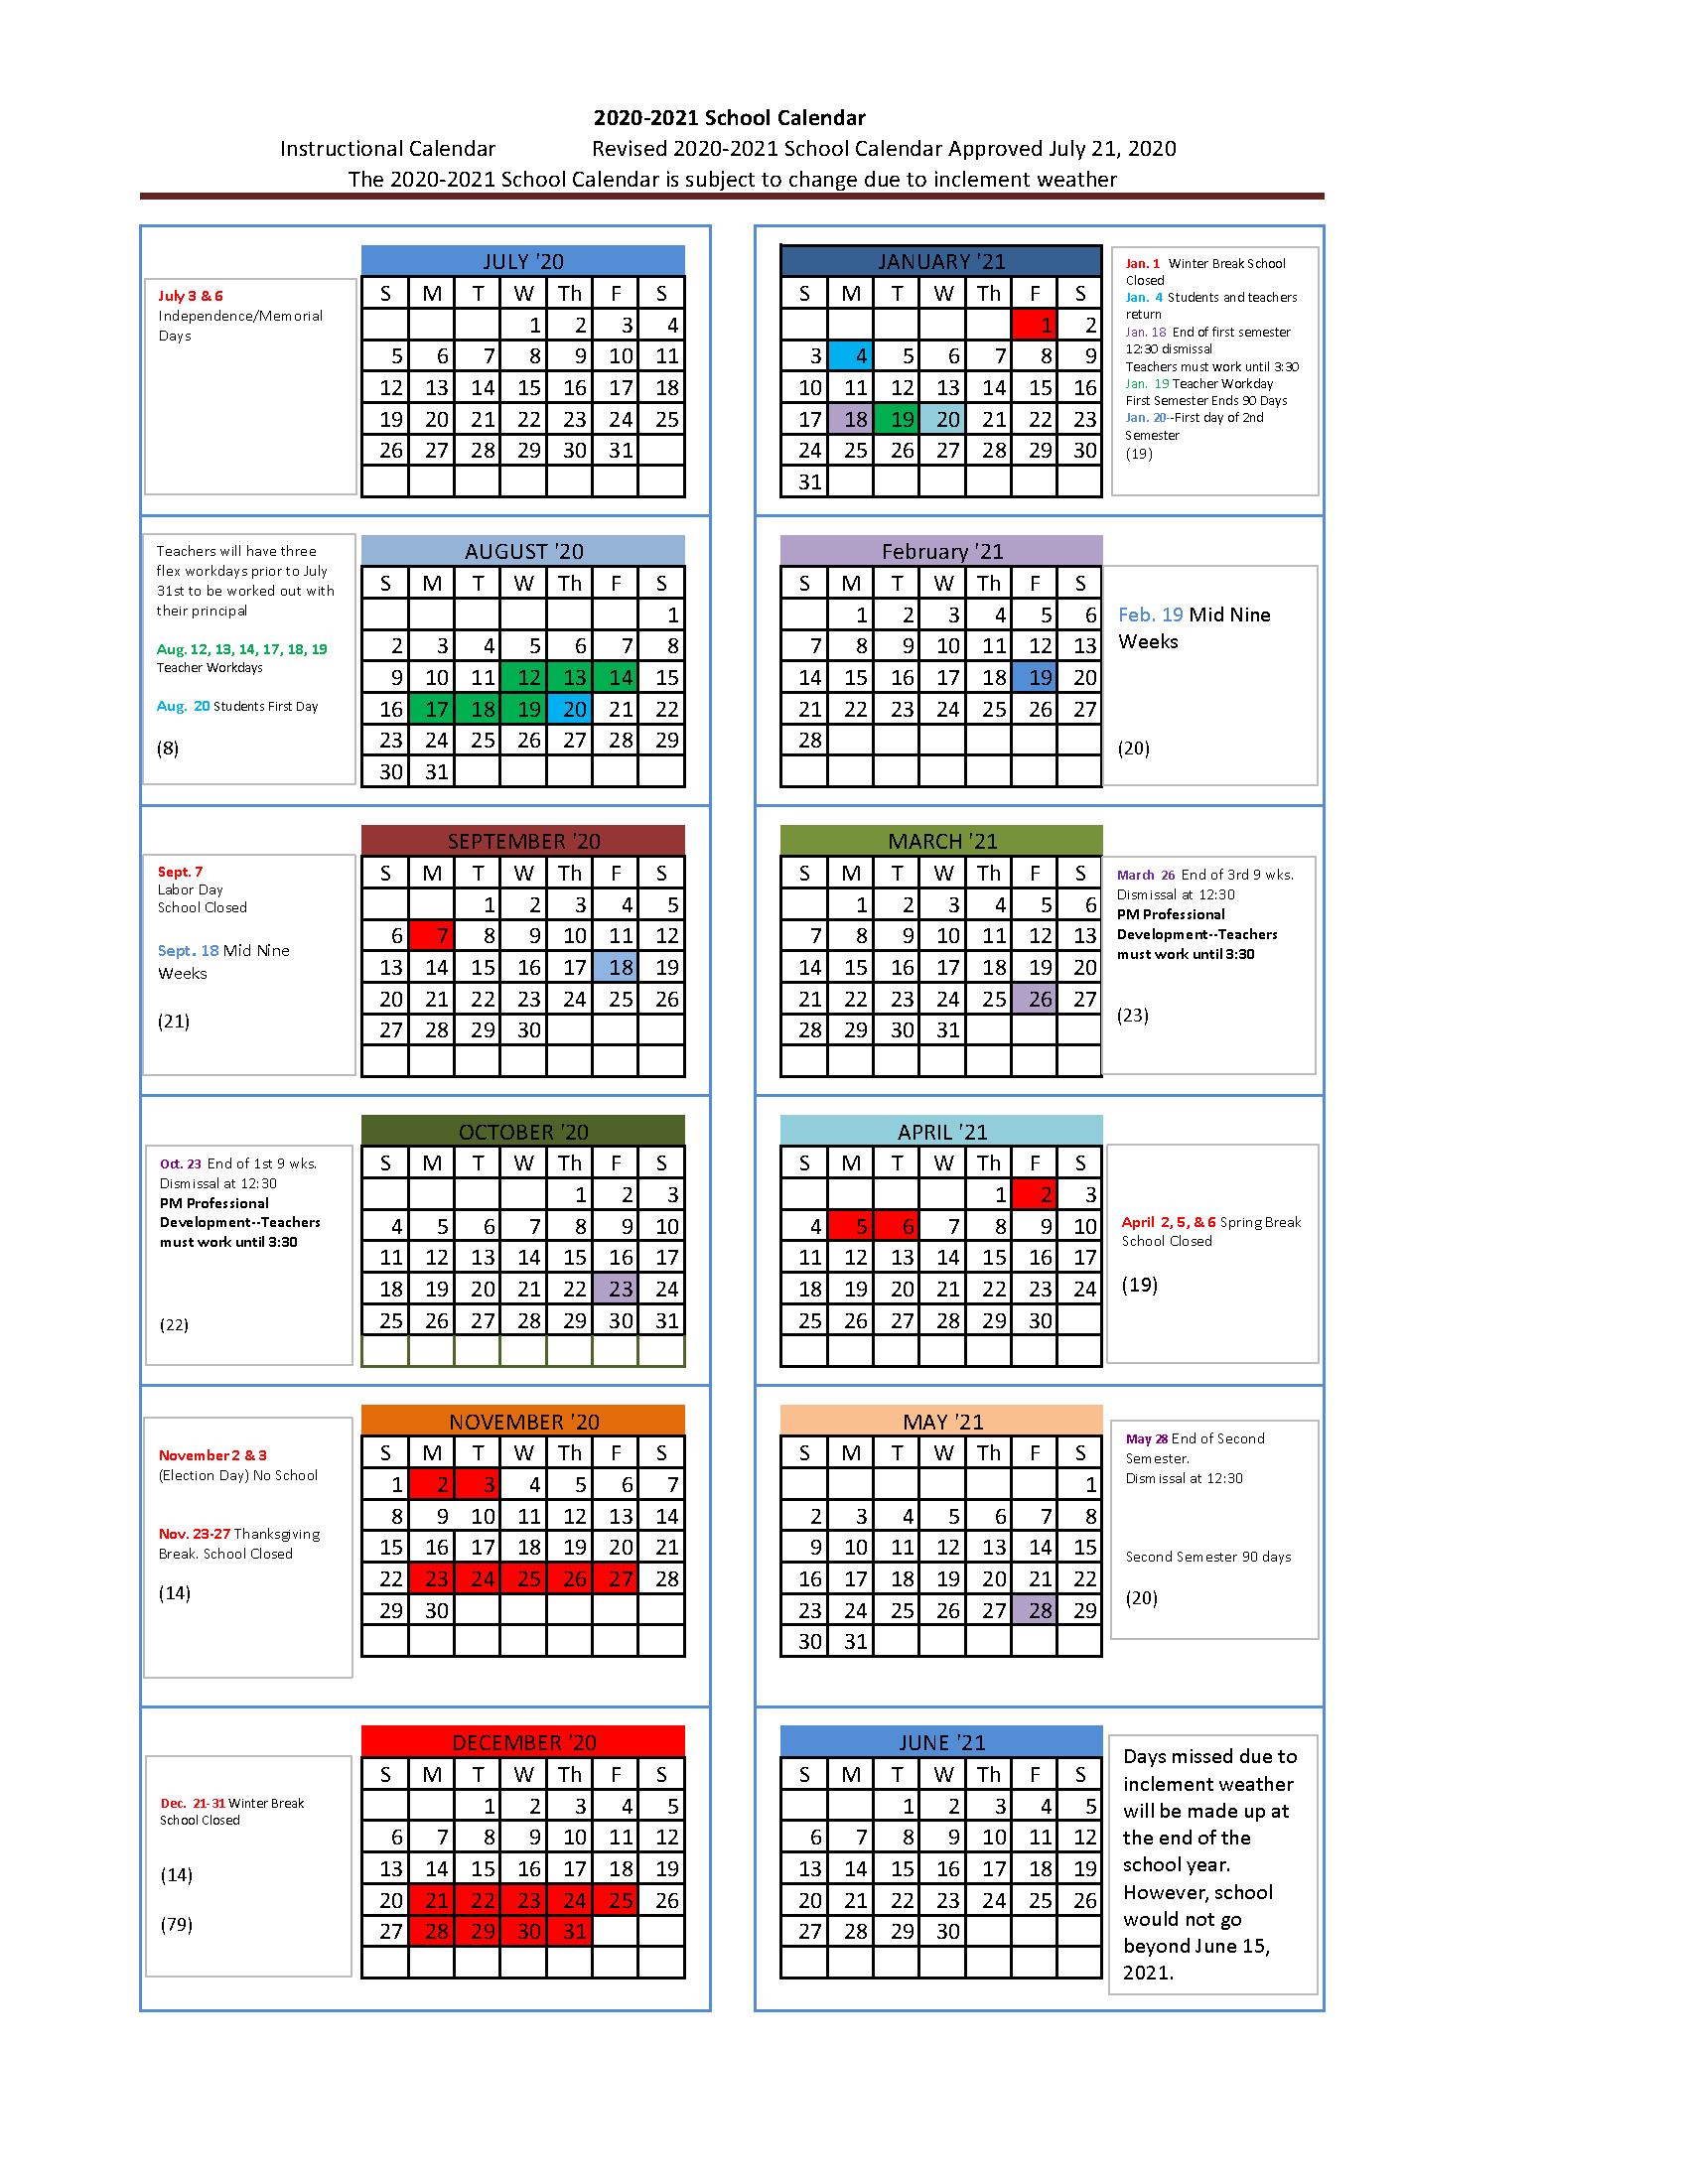 2020-2021 Wise County Schools Calendar